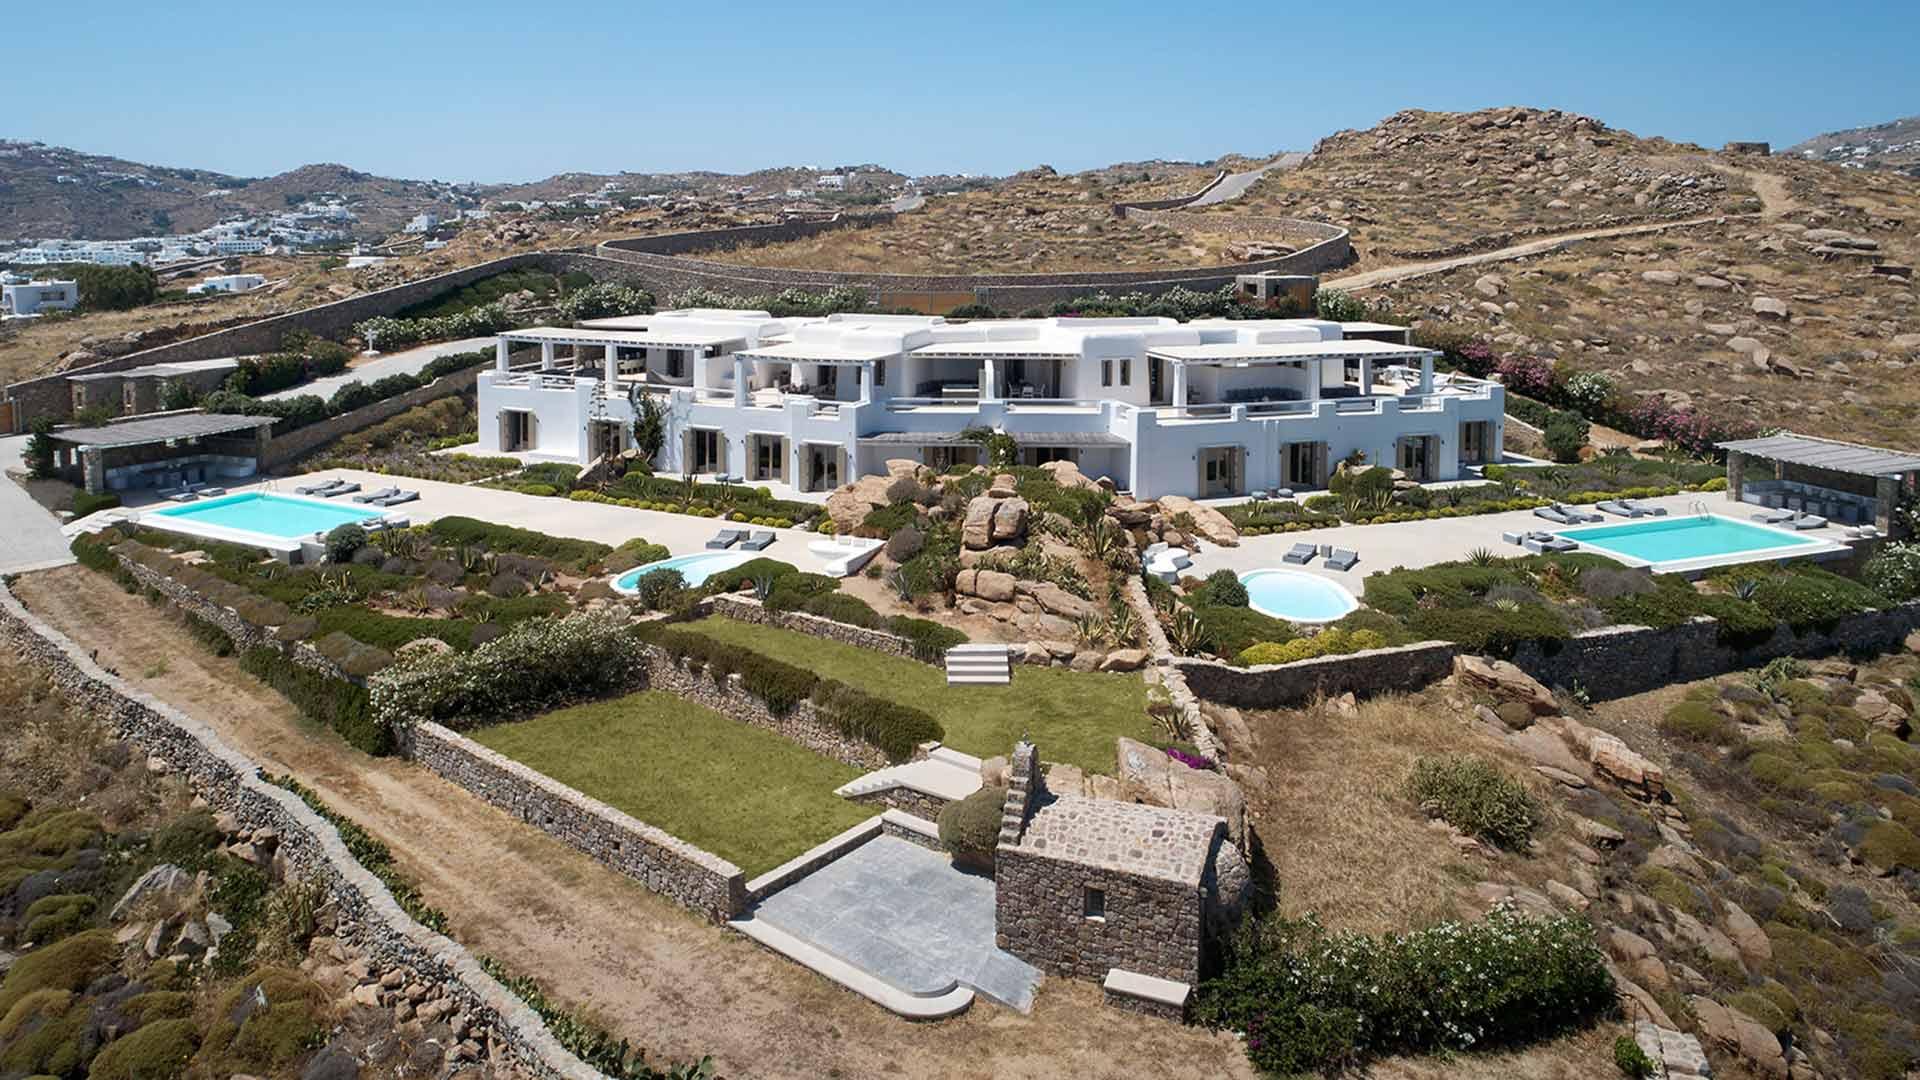 Villa Almosni Retreat